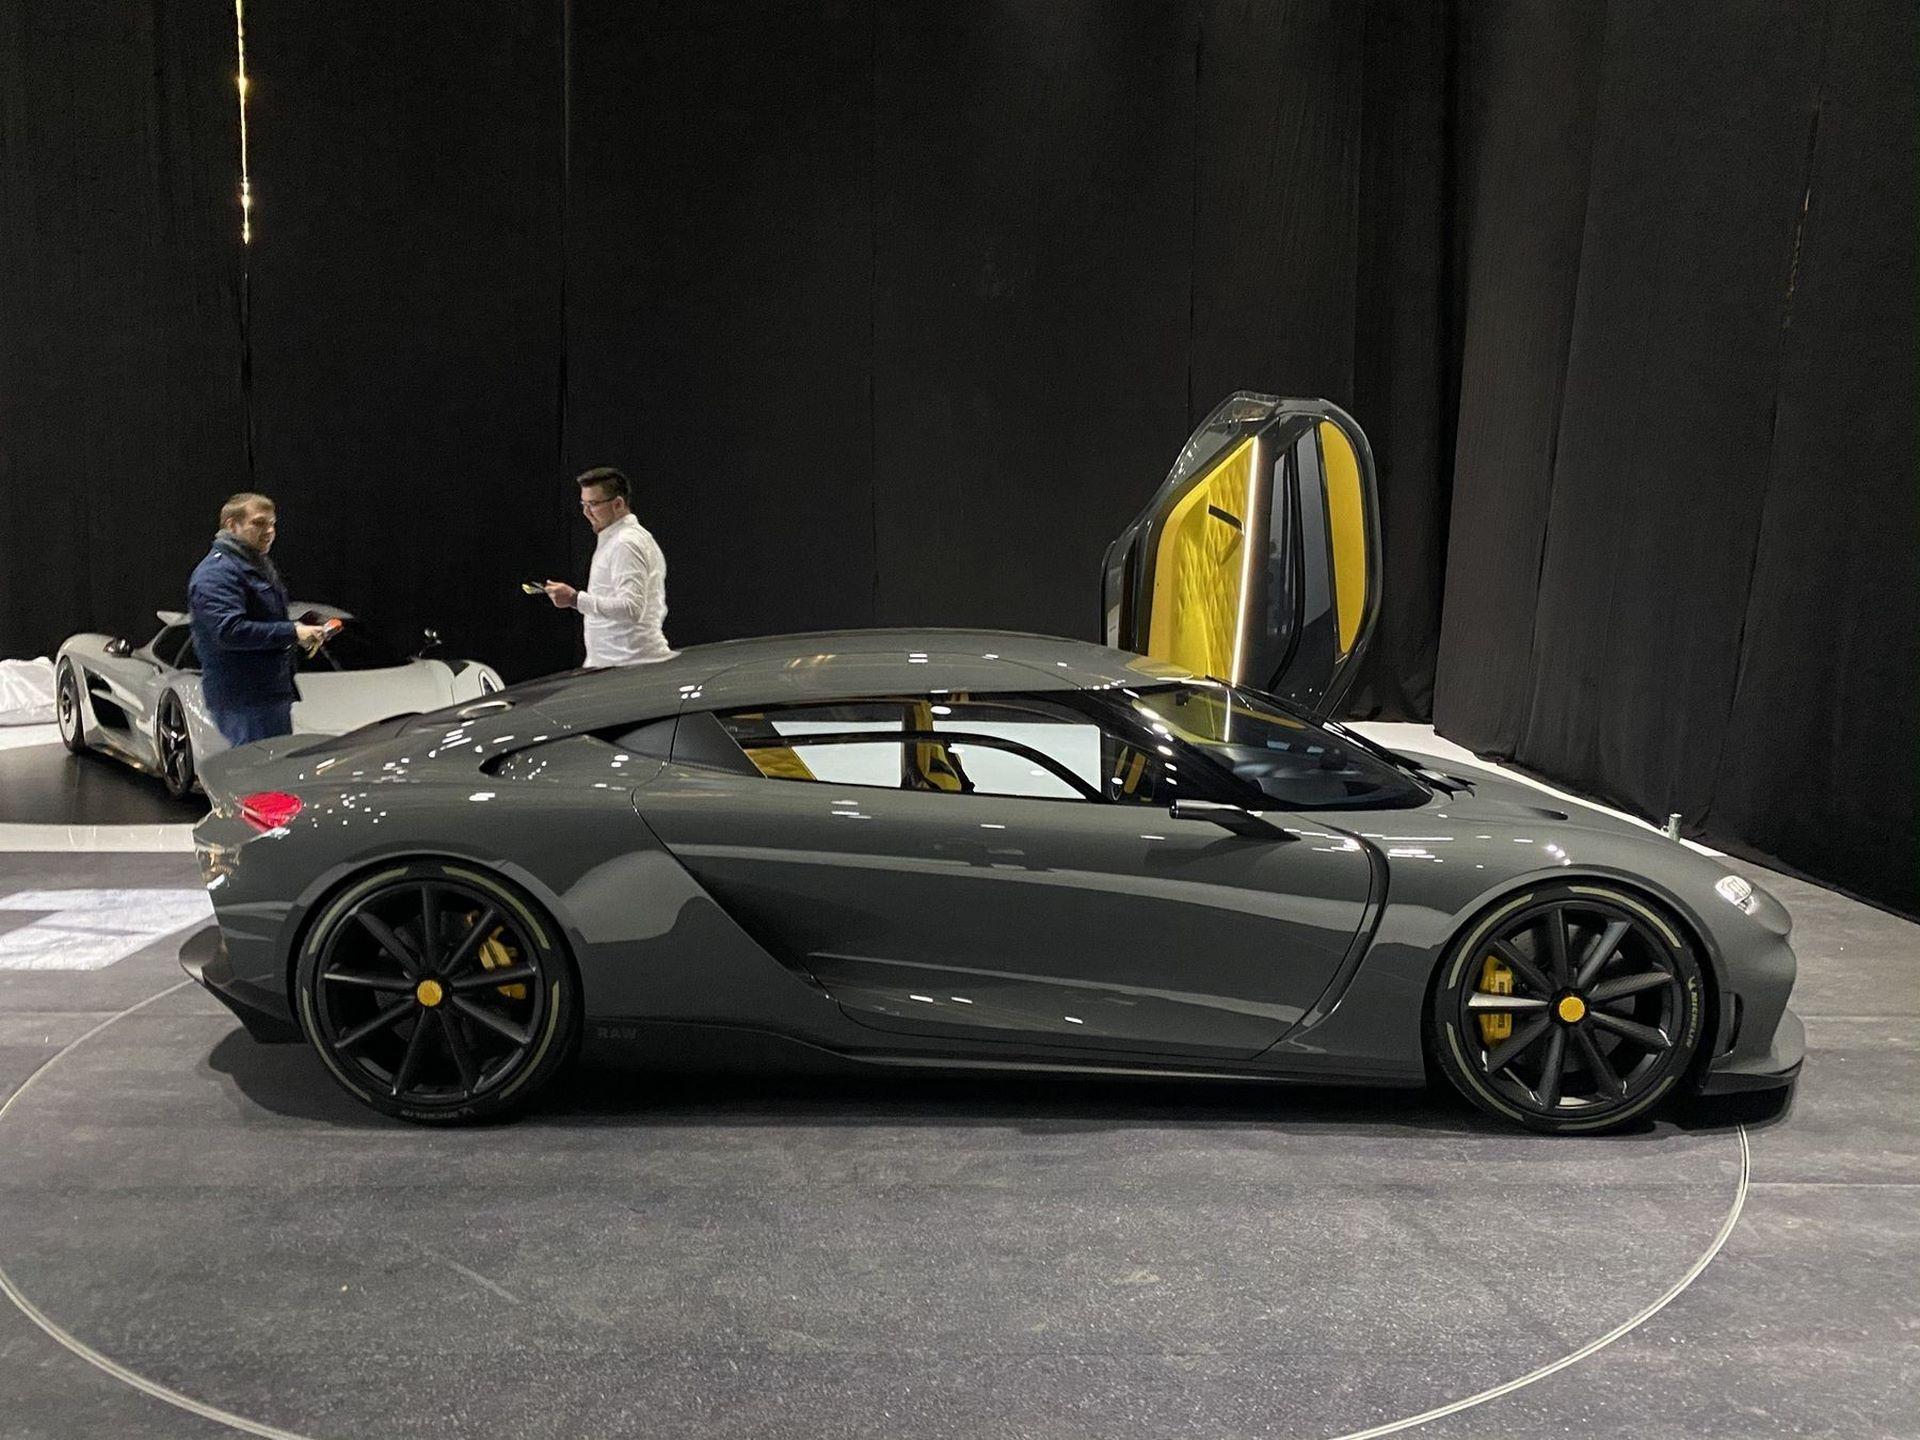 Geneva motor show 2020 (11)